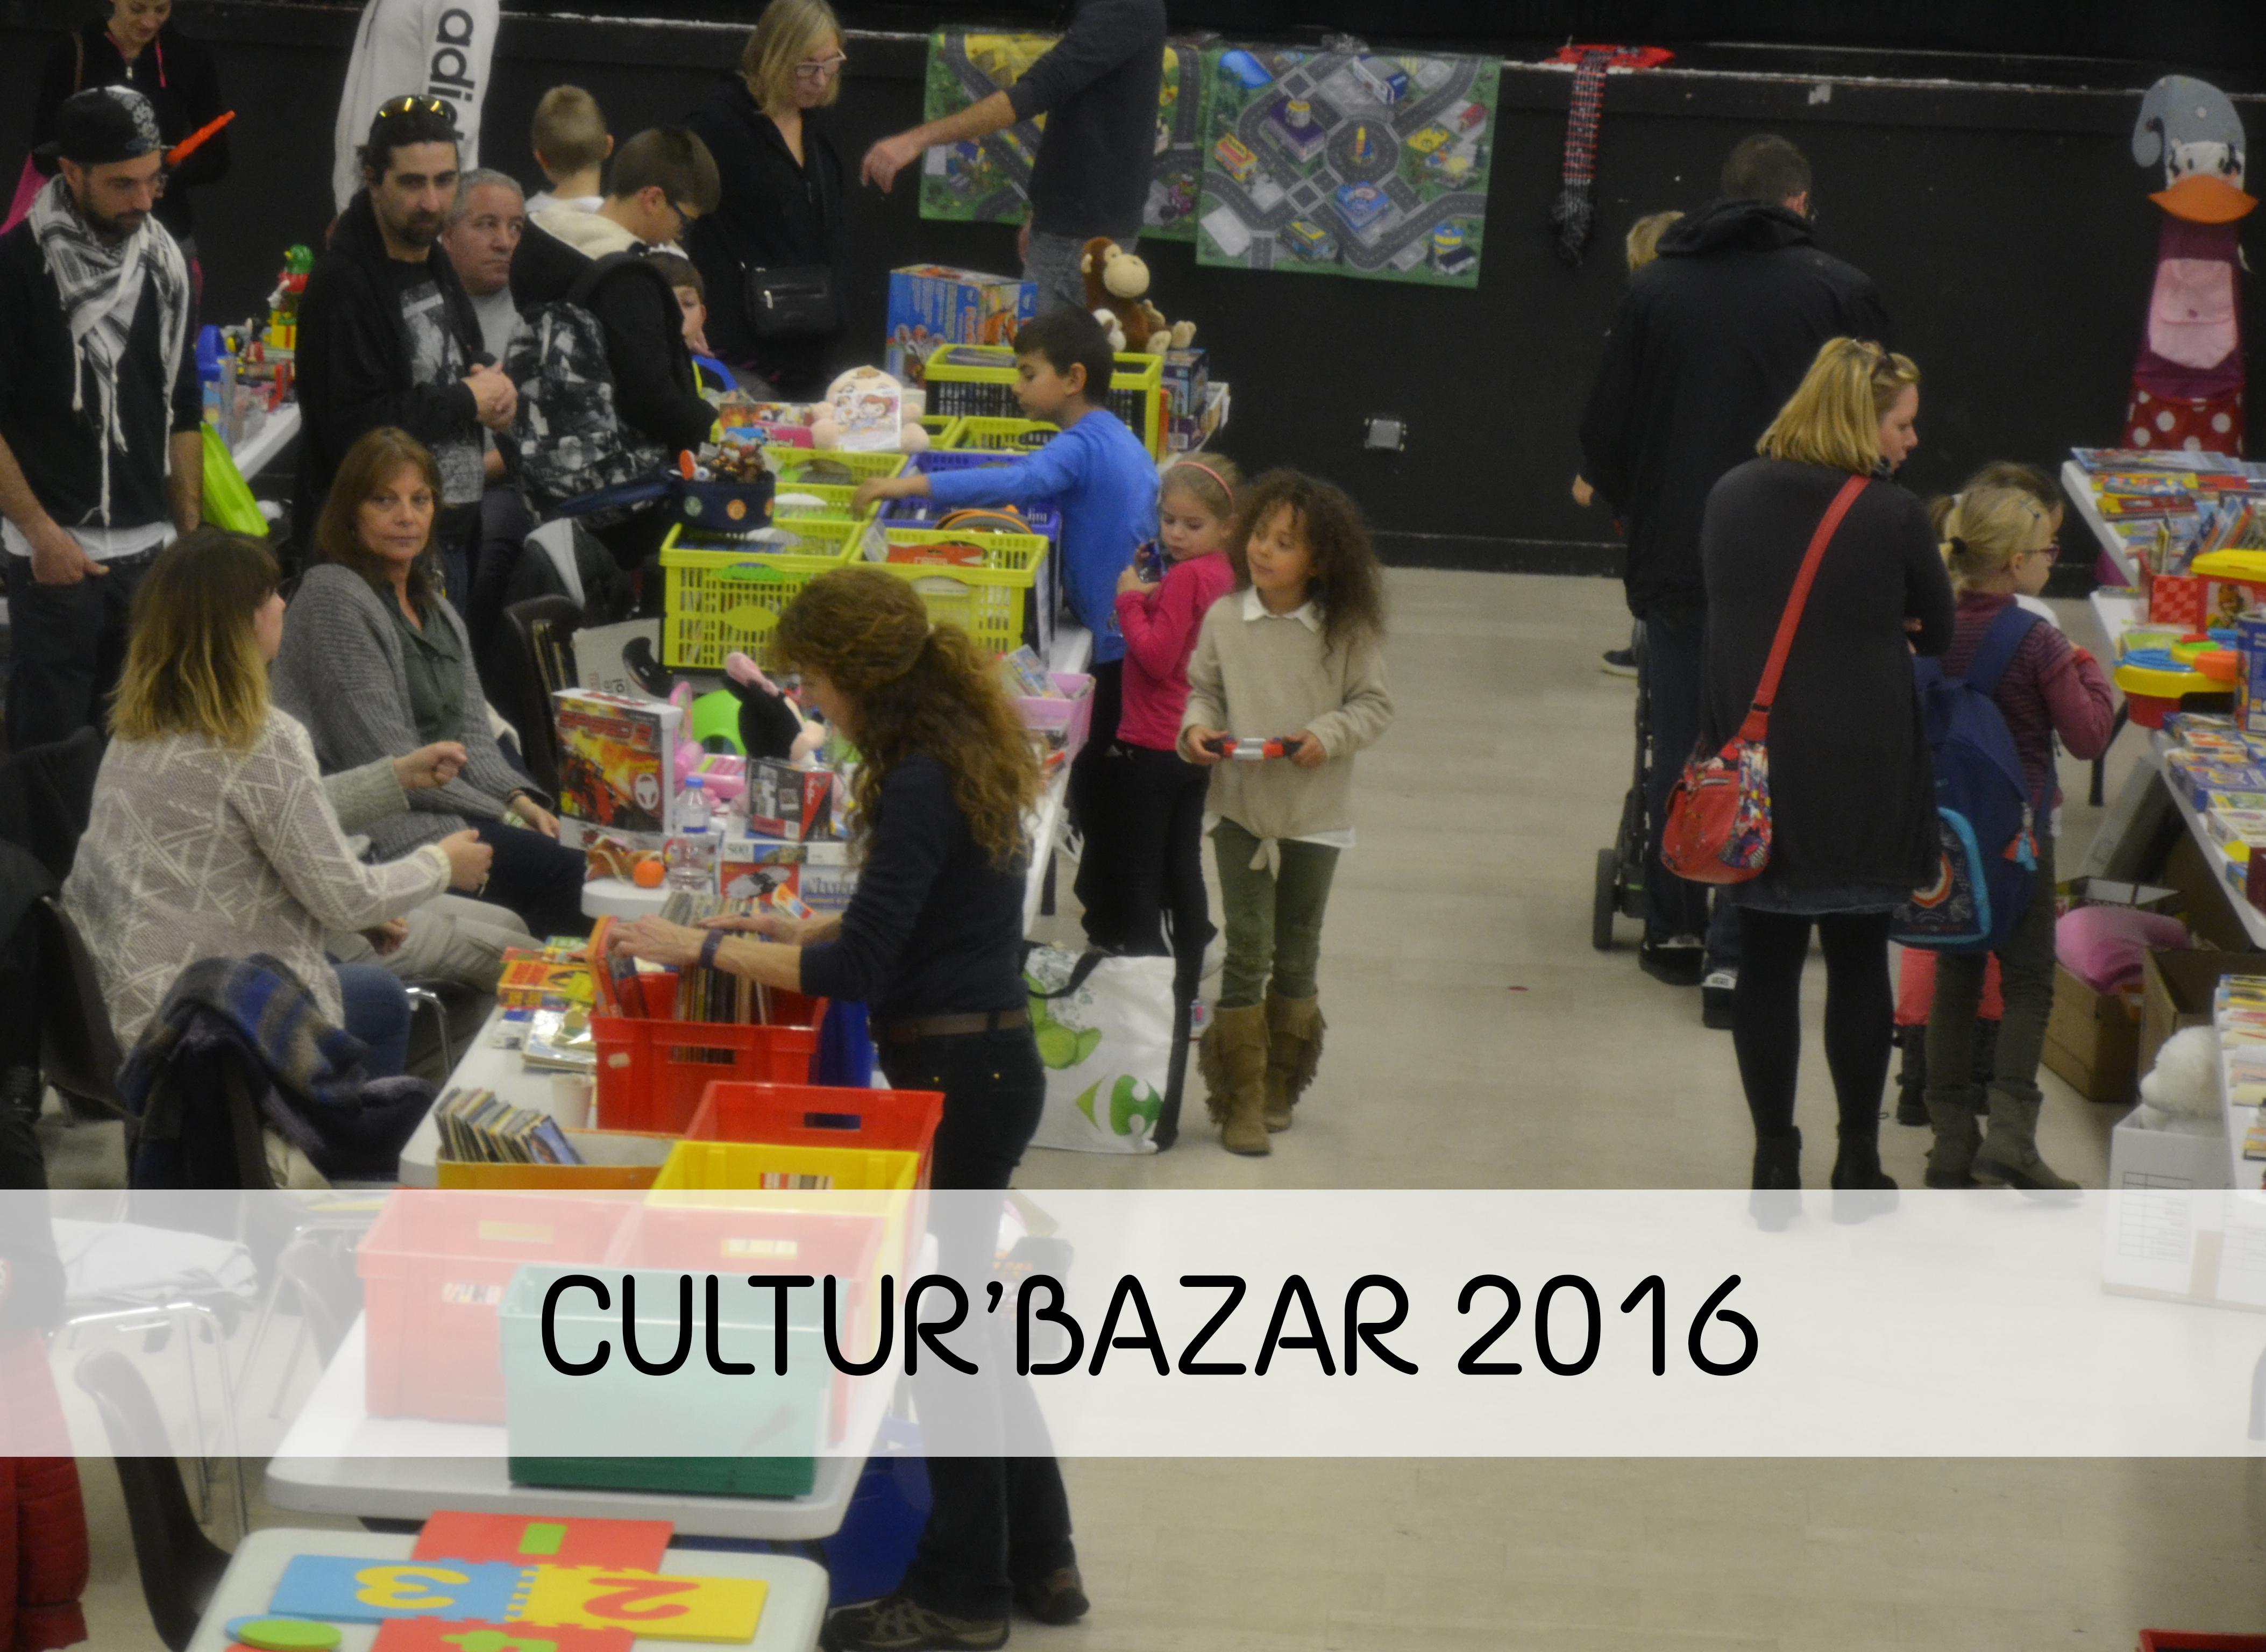 cult-bazar